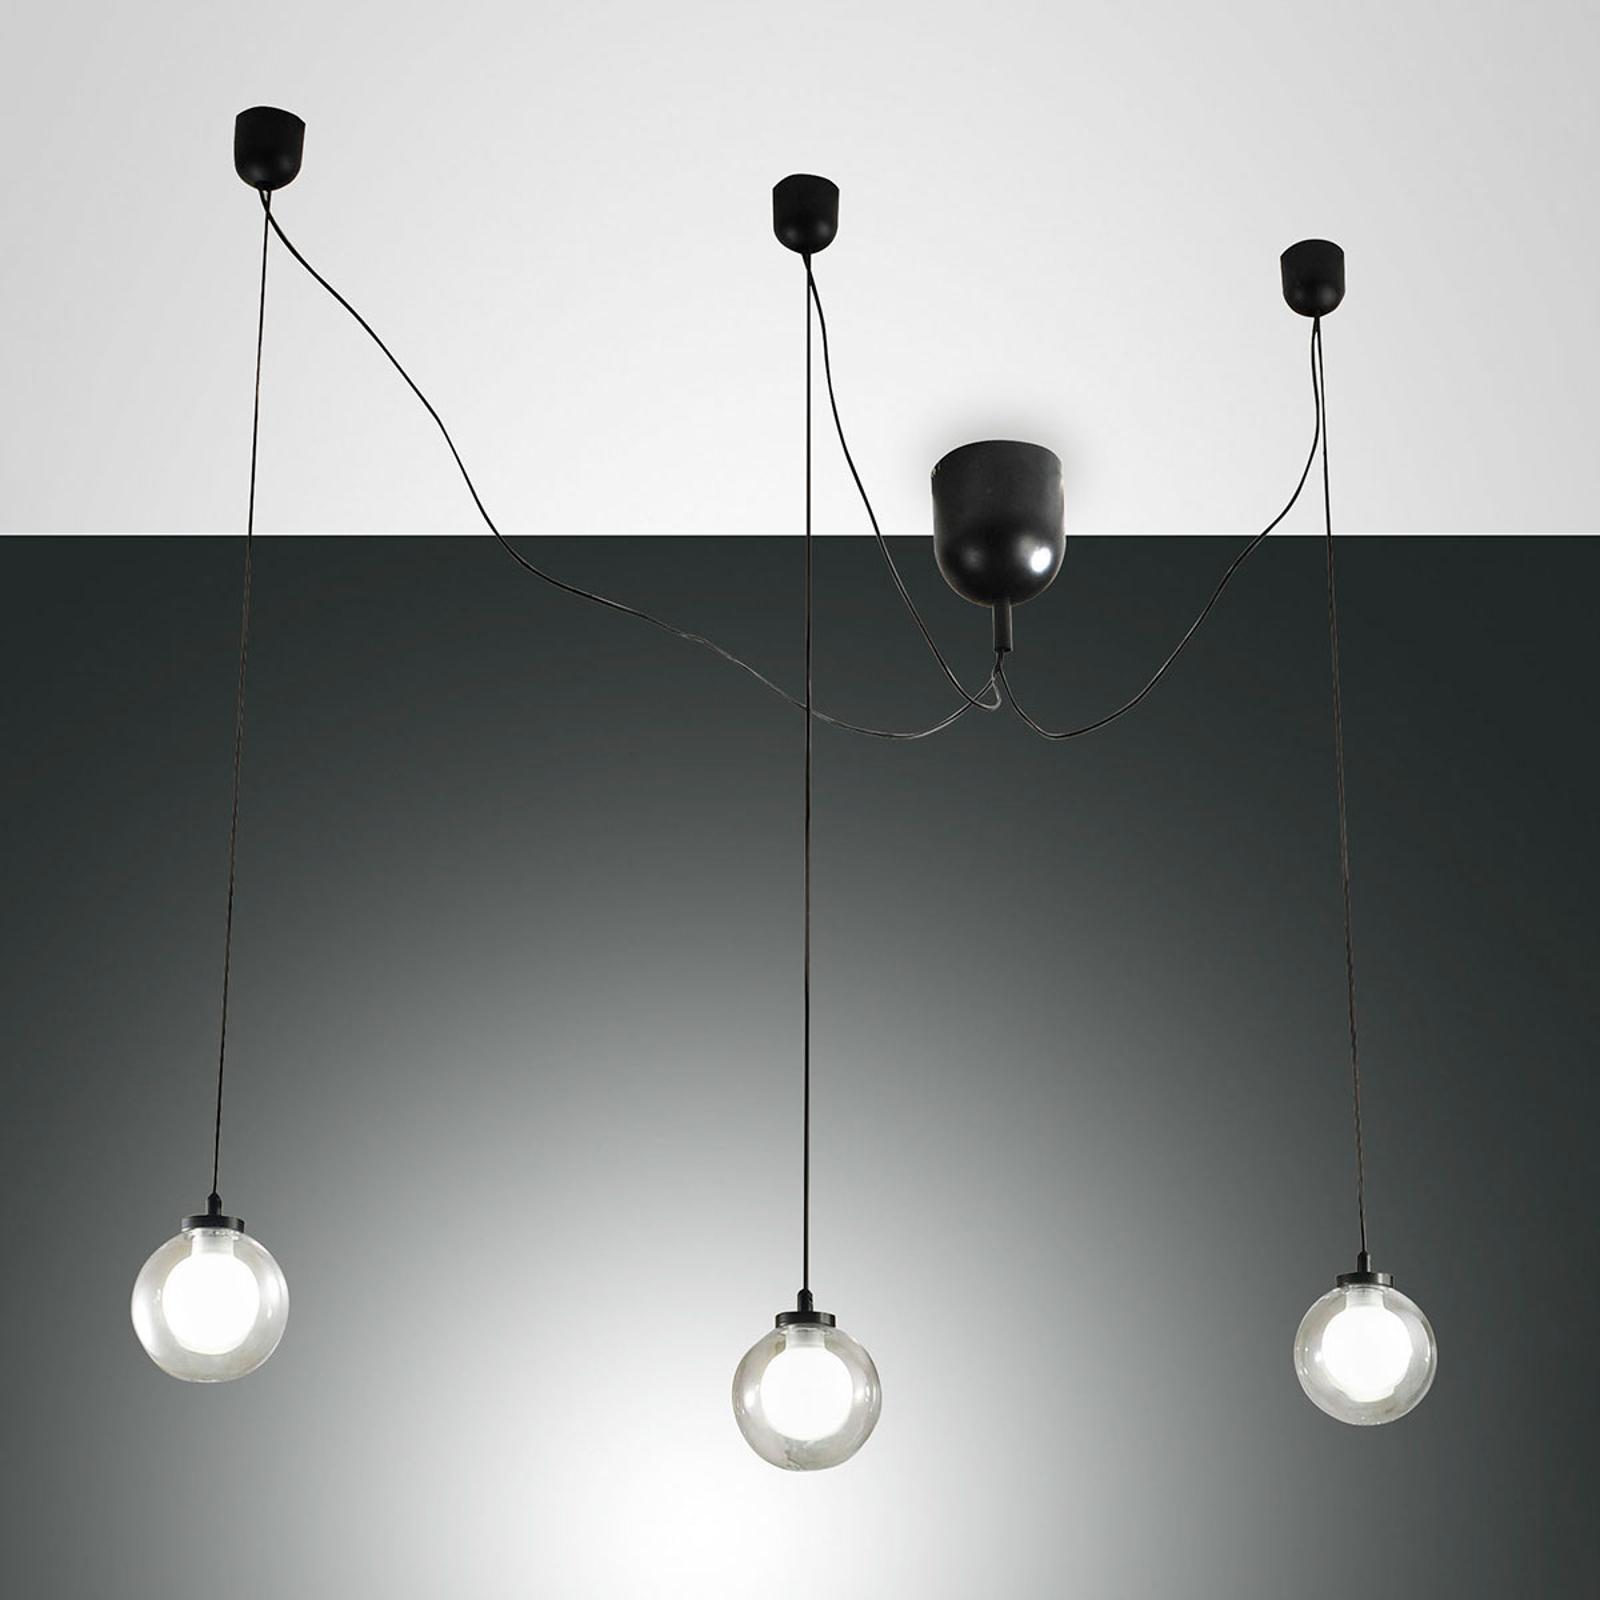 Acquista Lampada LED a sospensione Blog, 3 luci